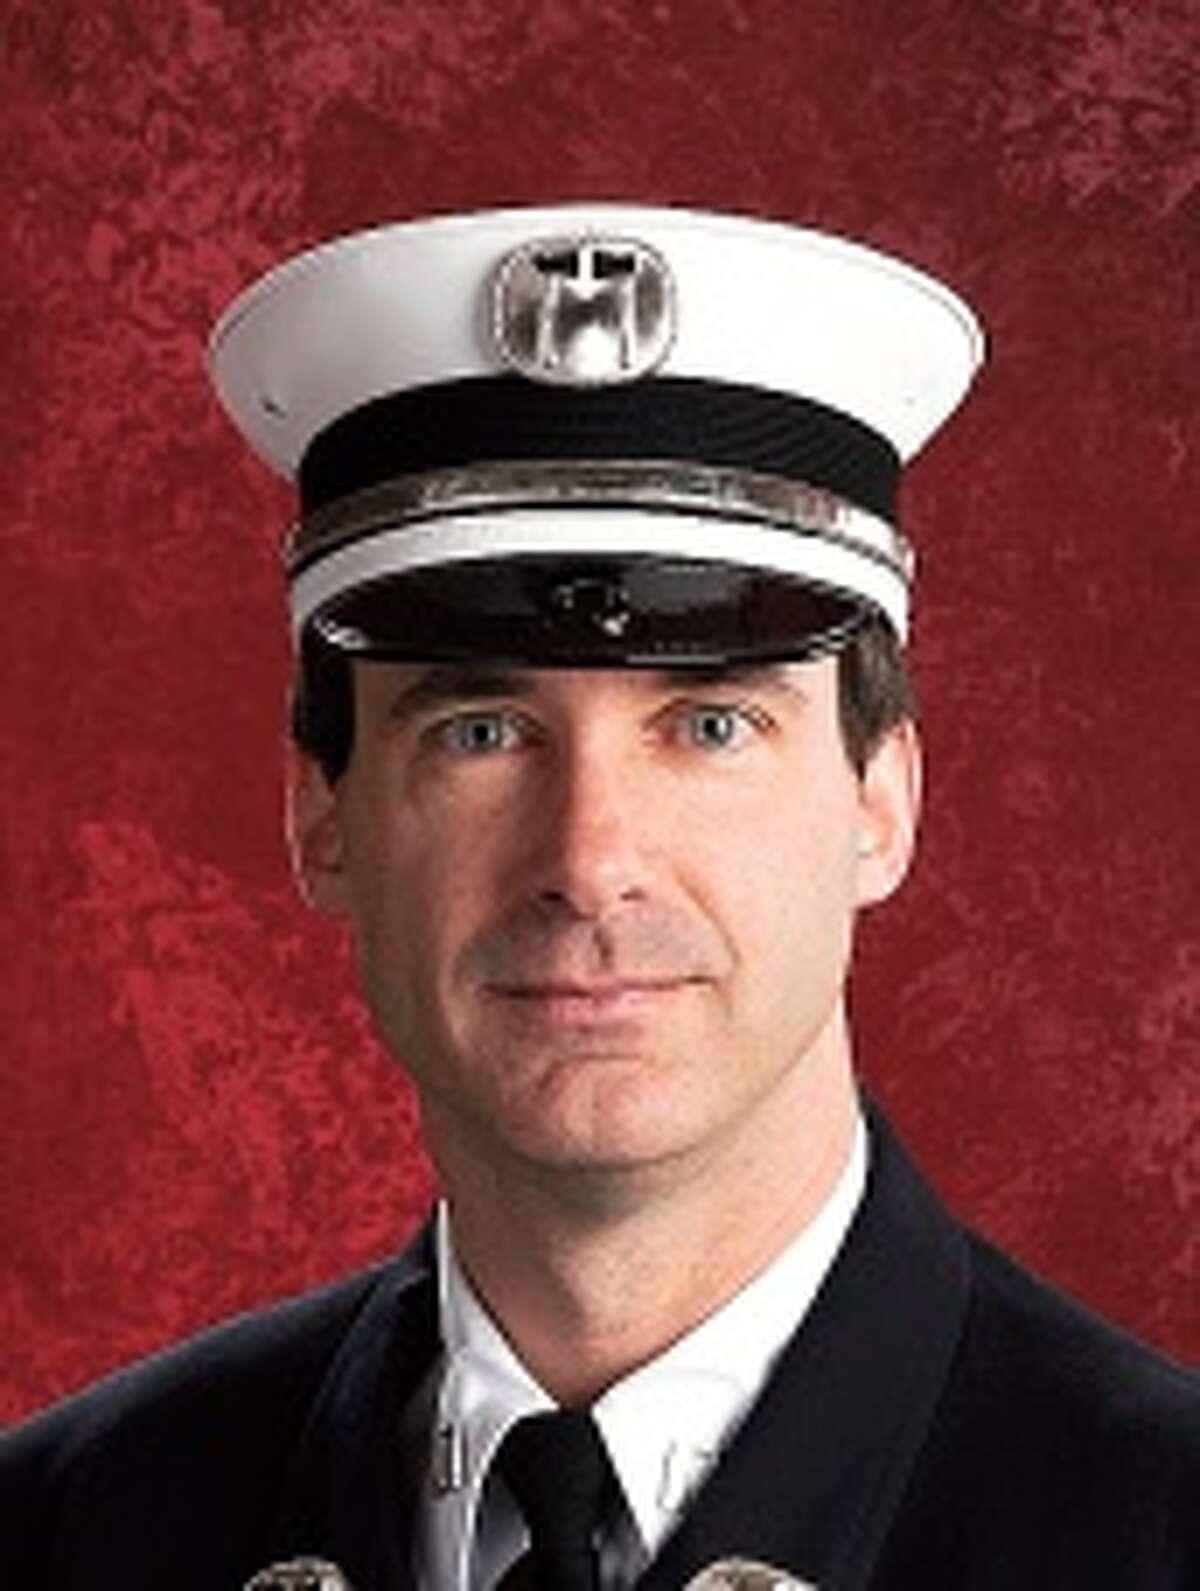 Schenectady Fire Department Captain John Nicol